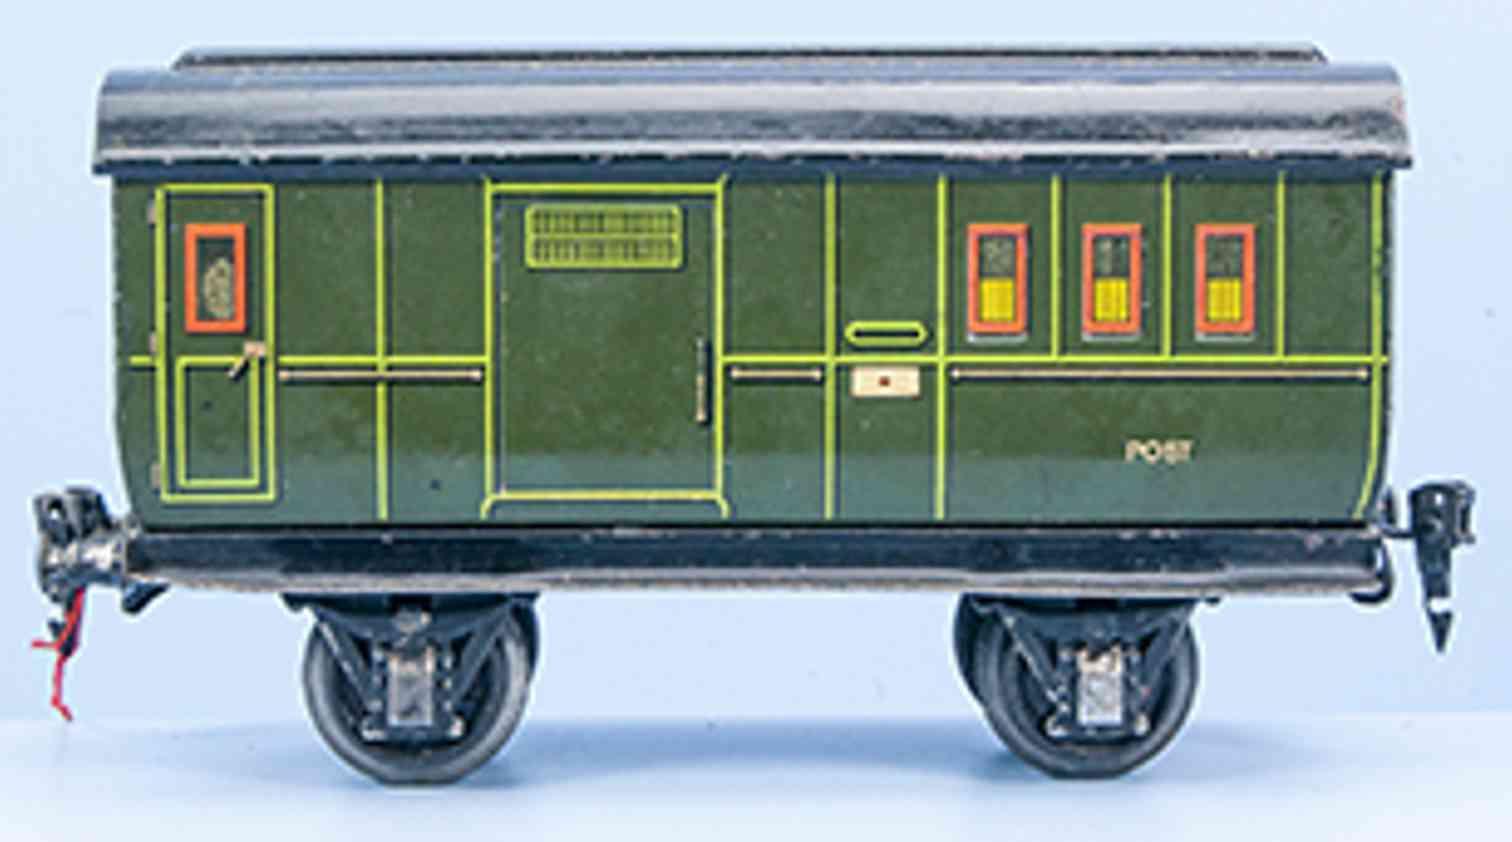 marklin maerklin 1903/1 railway toy mail baggage car green hand-painted gauge 1